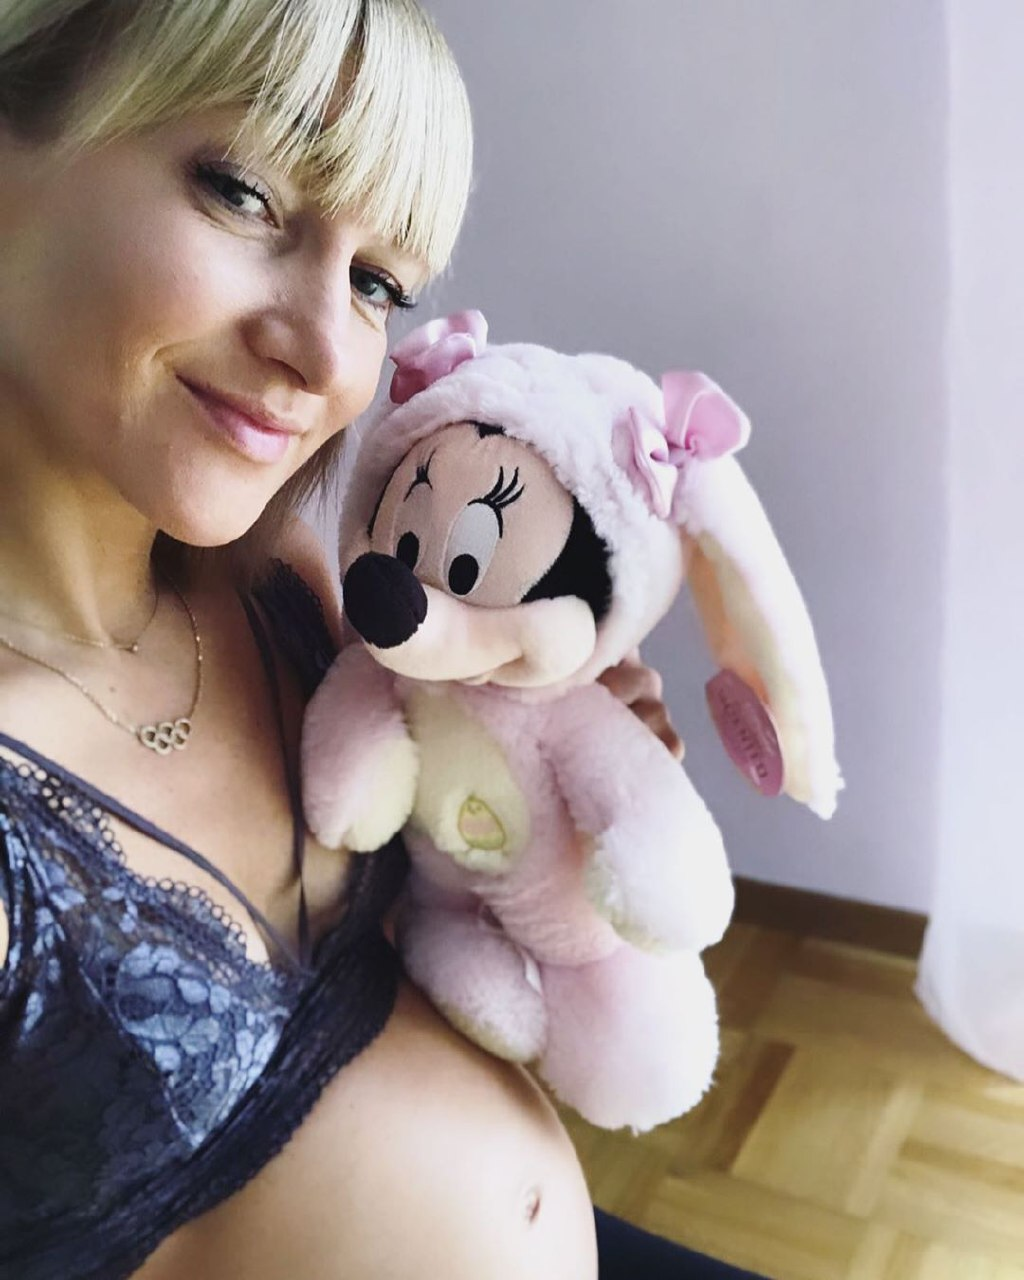 Алена Савченко - Бруно Массо / Aliona SAVCHENKO - Bruno MASSOT GER - Страница 25 Db3fd48daa15f80d20be531c50a8d739